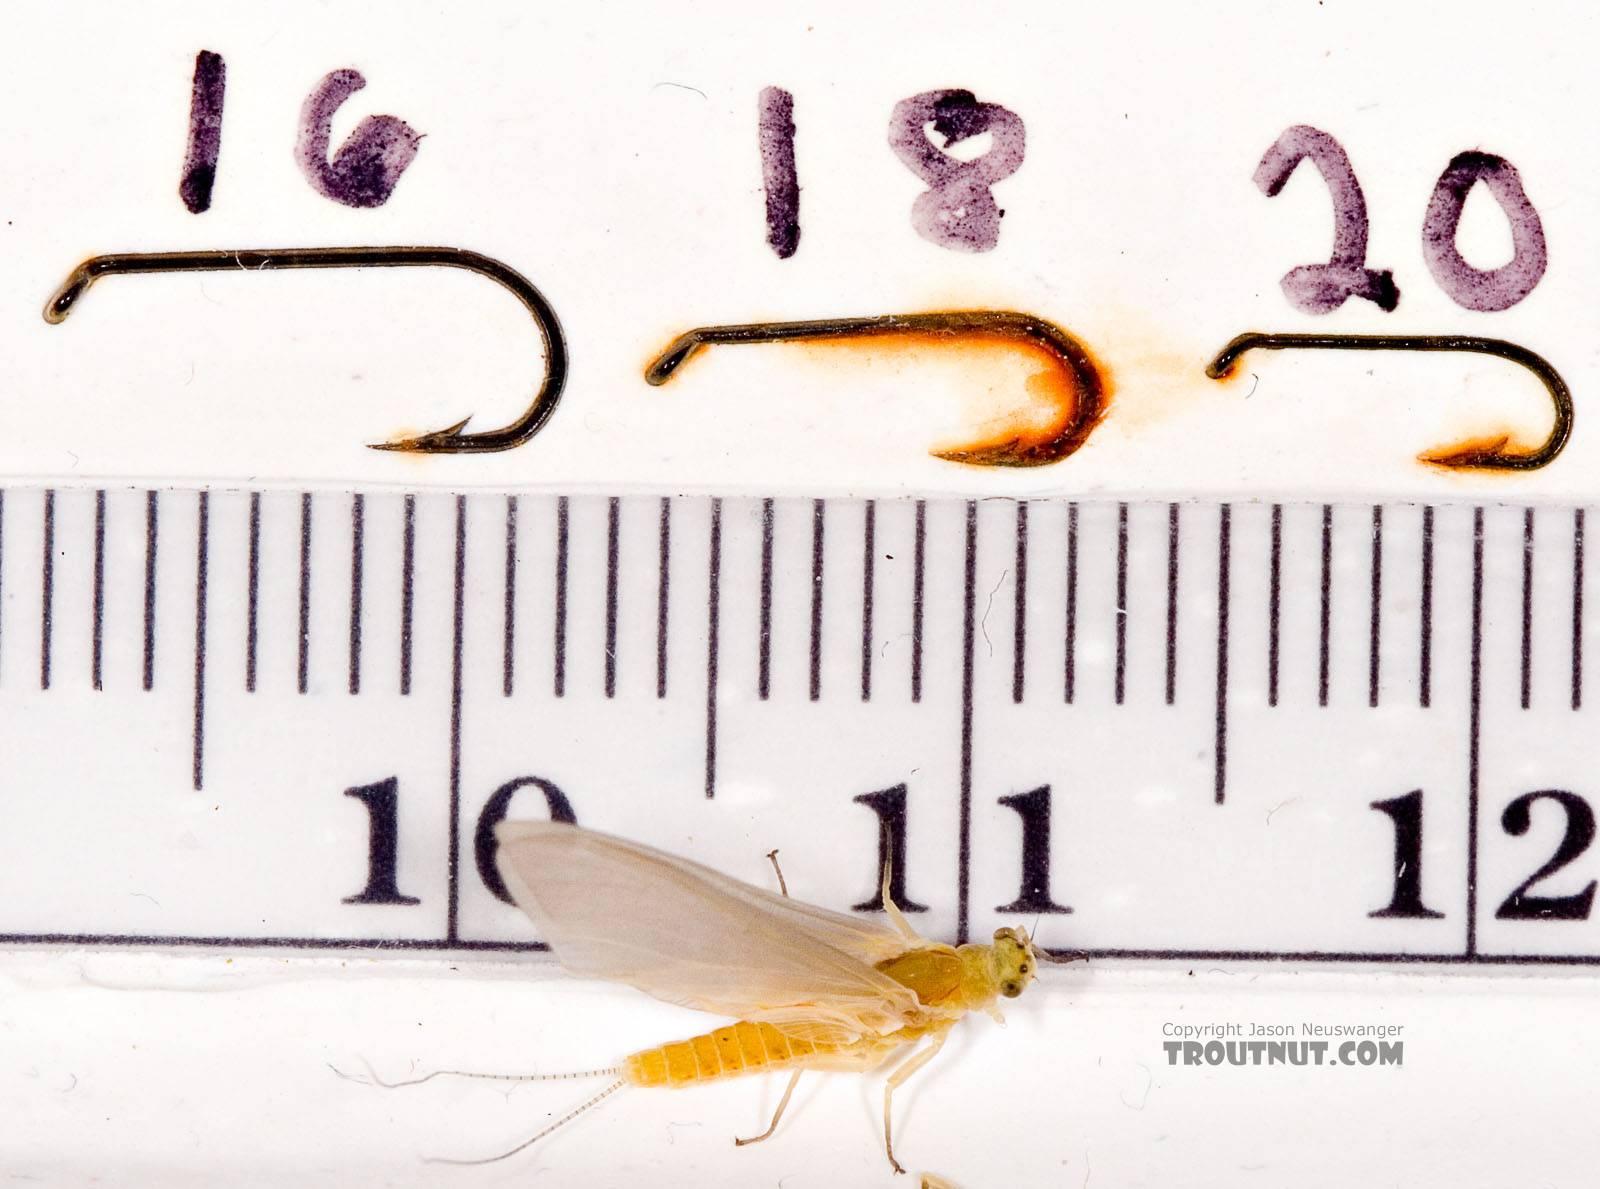 Female Ephemerella invaria (Sulphur Dun) Mayfly Dun from the Little Juniata River in Pennsylvania